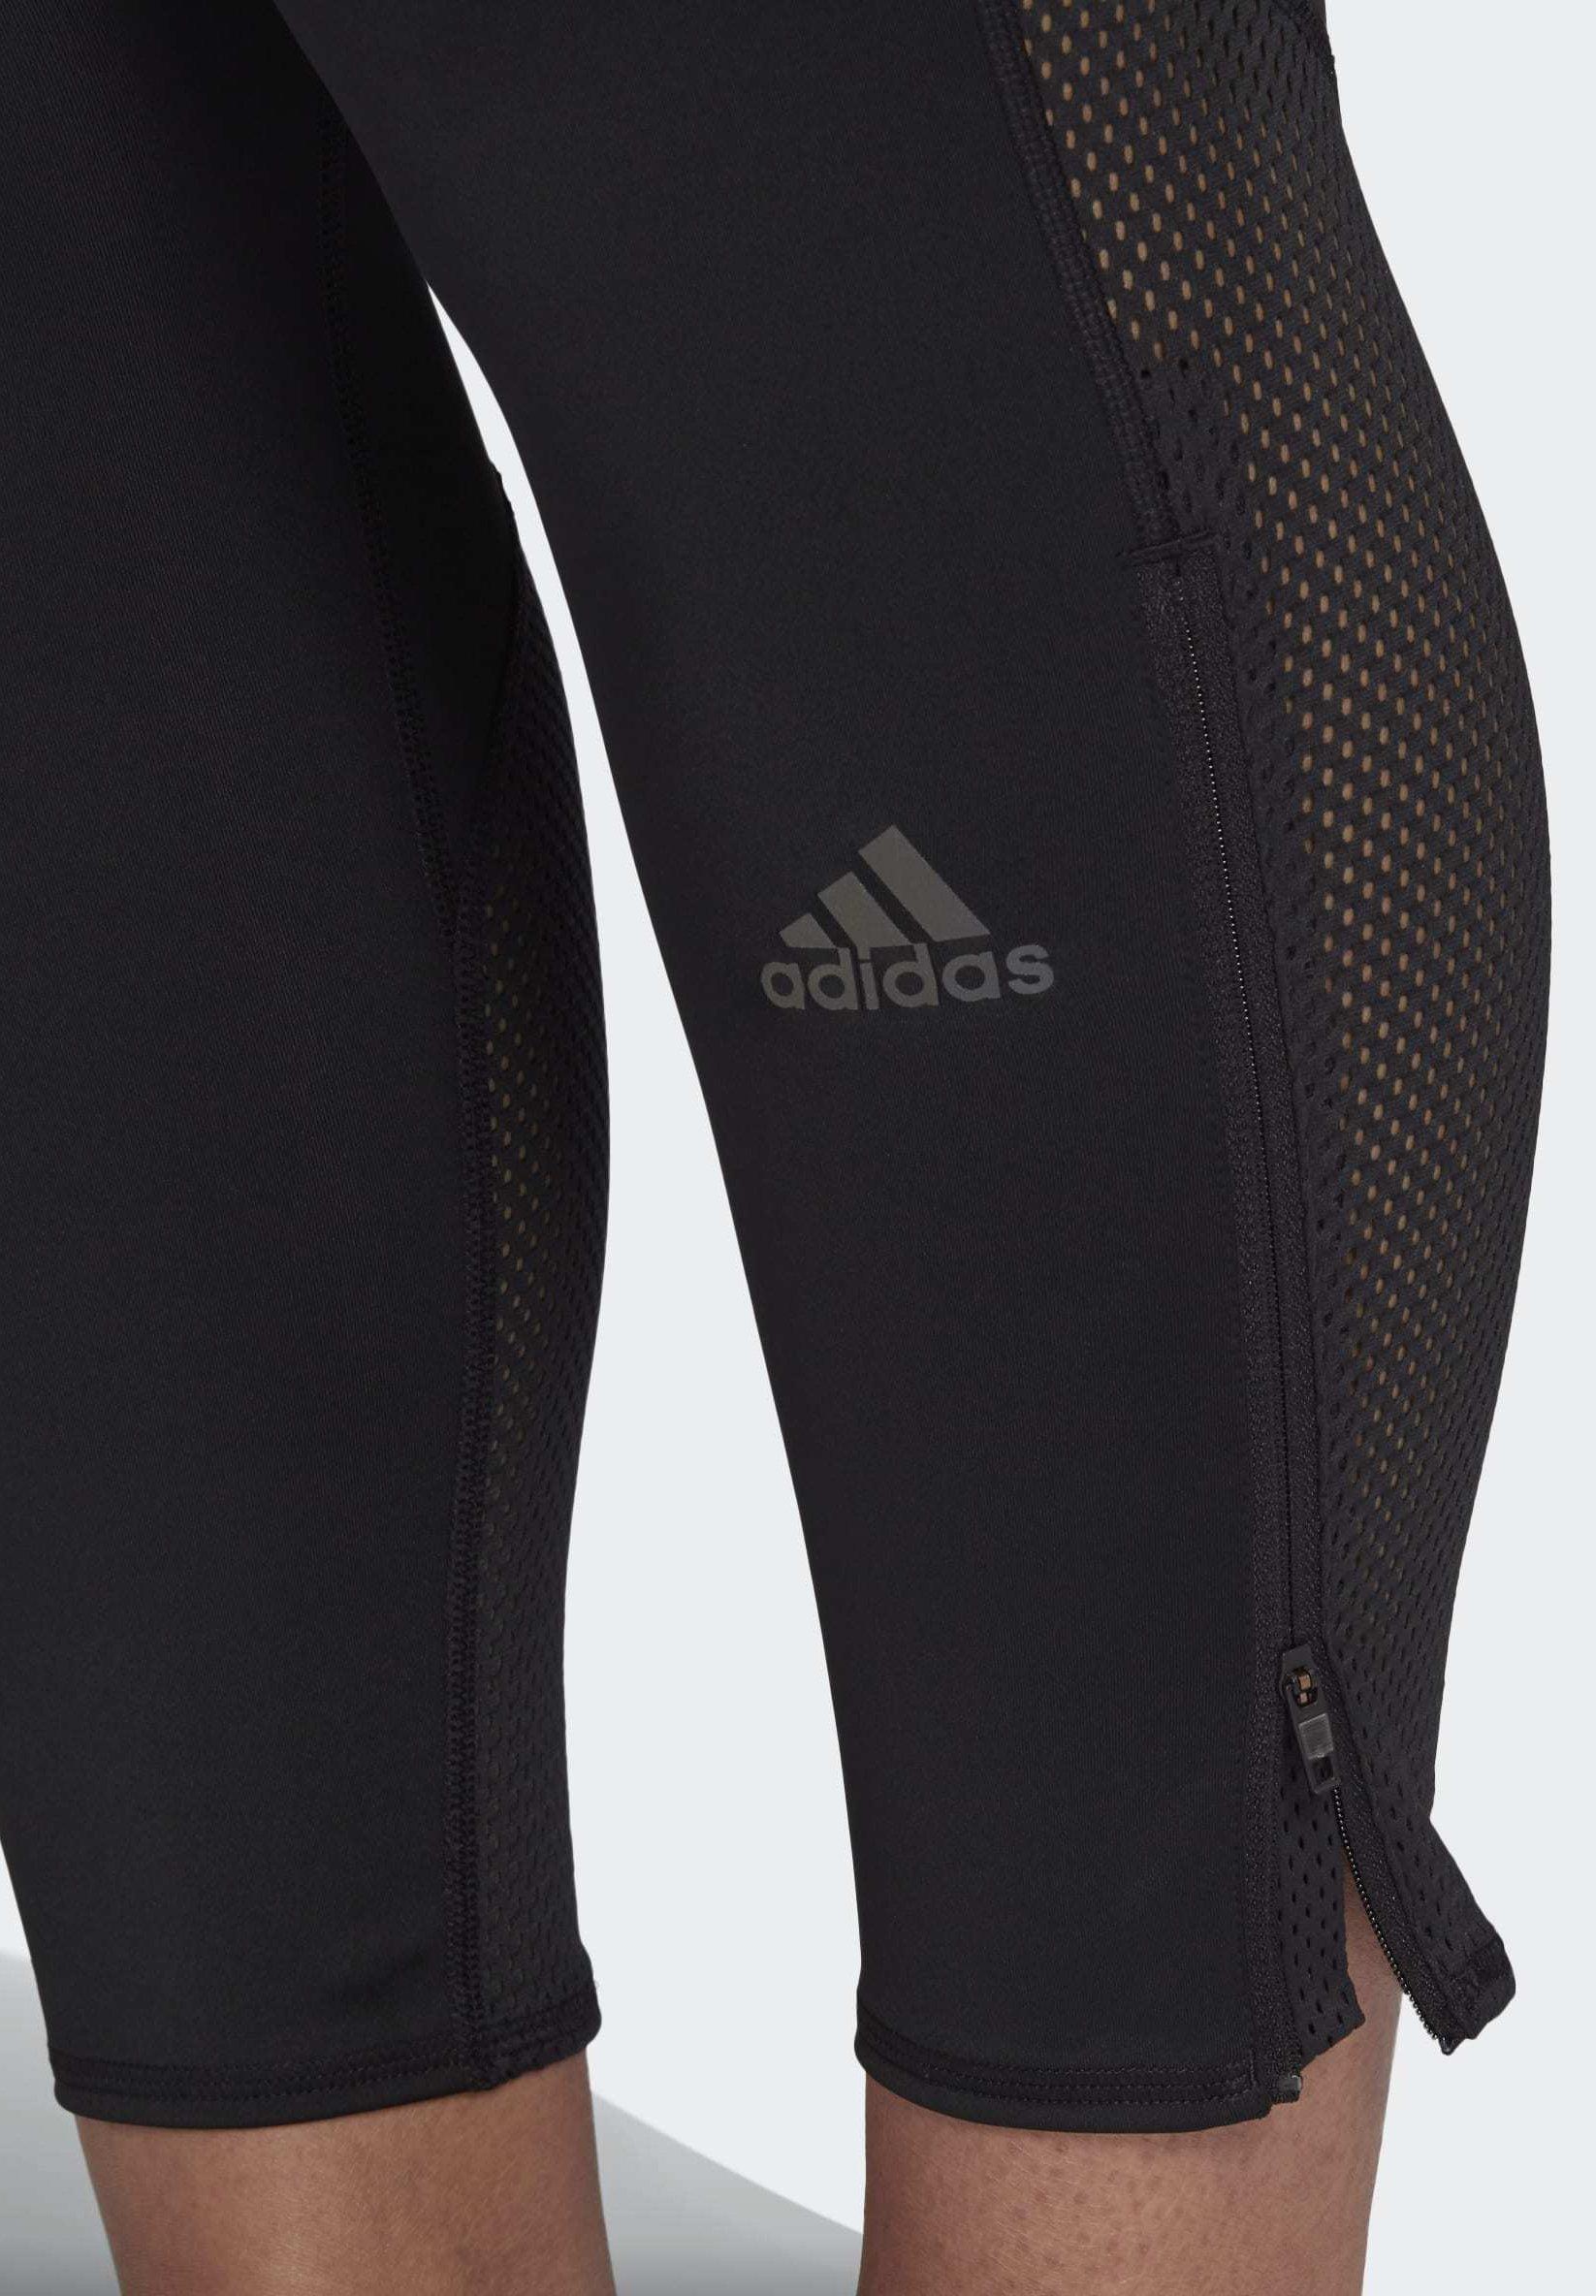 The Cheapest Women's Clothing adidas Performance HOW WE DO LONG LEGGINGS (PLUS SIZE) Leggings black xXI4J1Kxn